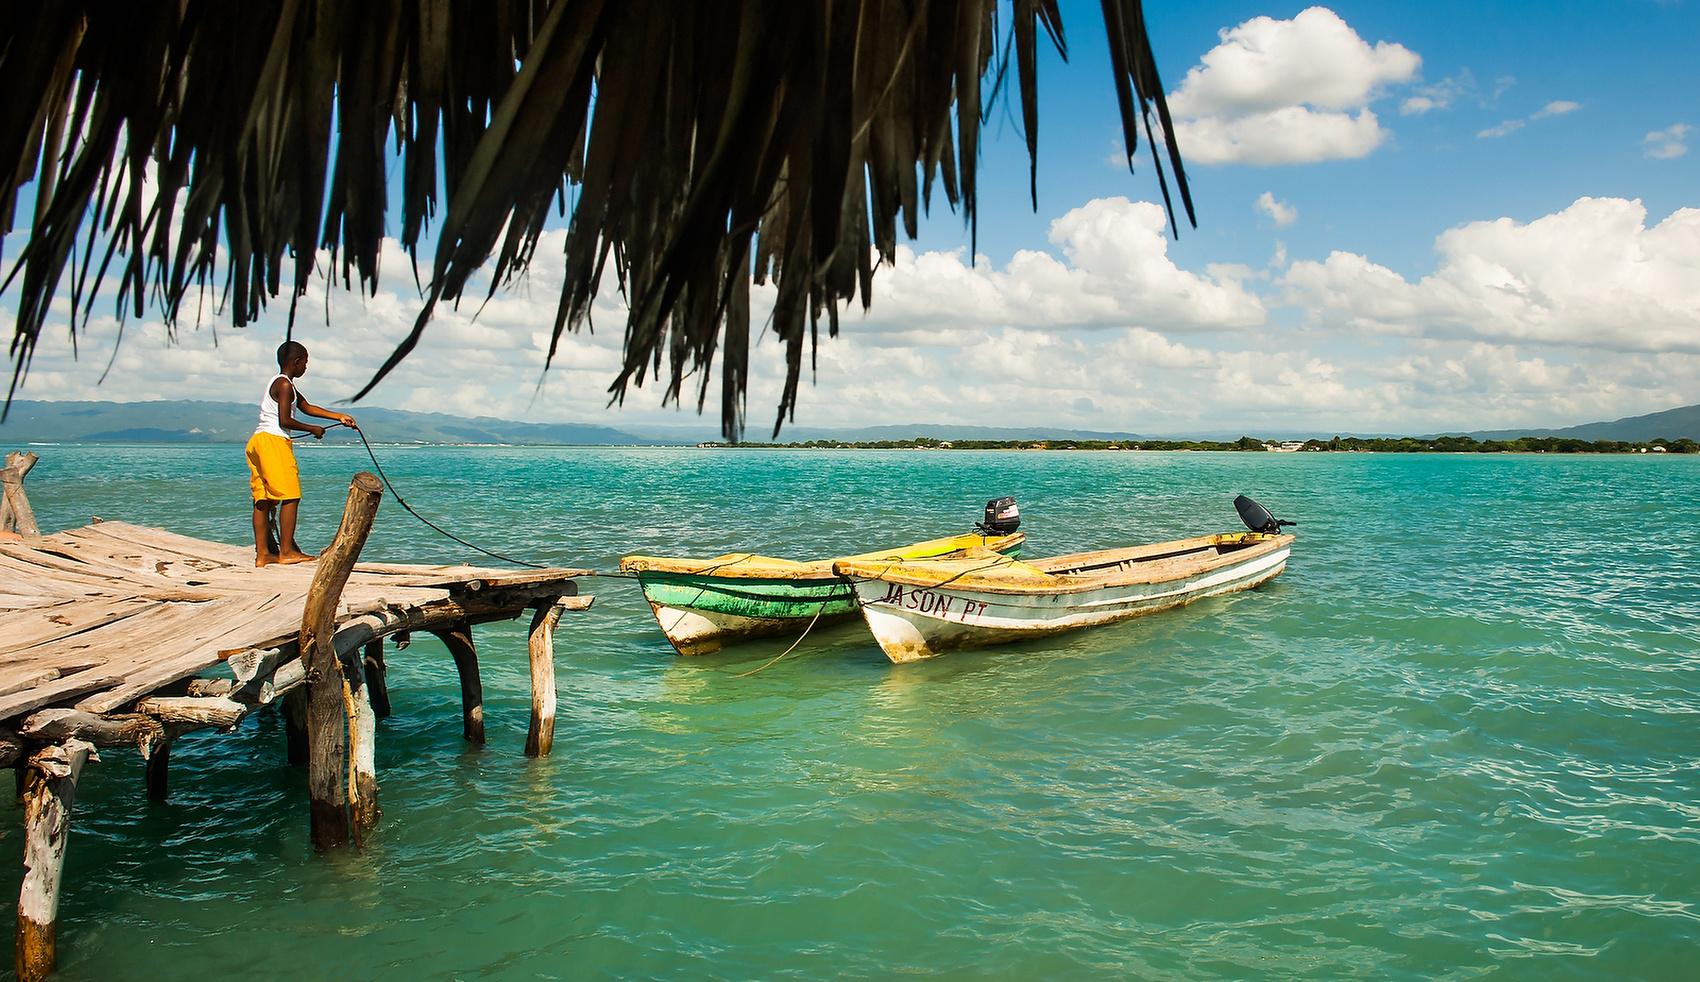 Lifestyle & Travel Photographer  Jake's Hotel at Treasure Beach, Jamaica